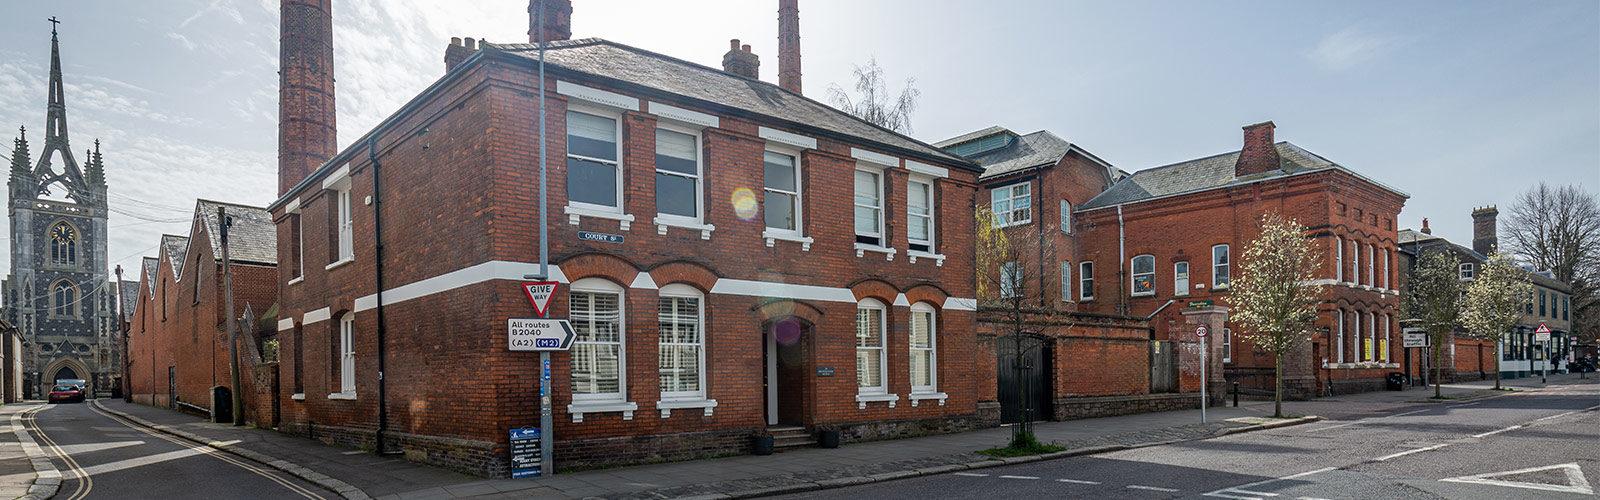 William Property Management Ltd - Meet The team